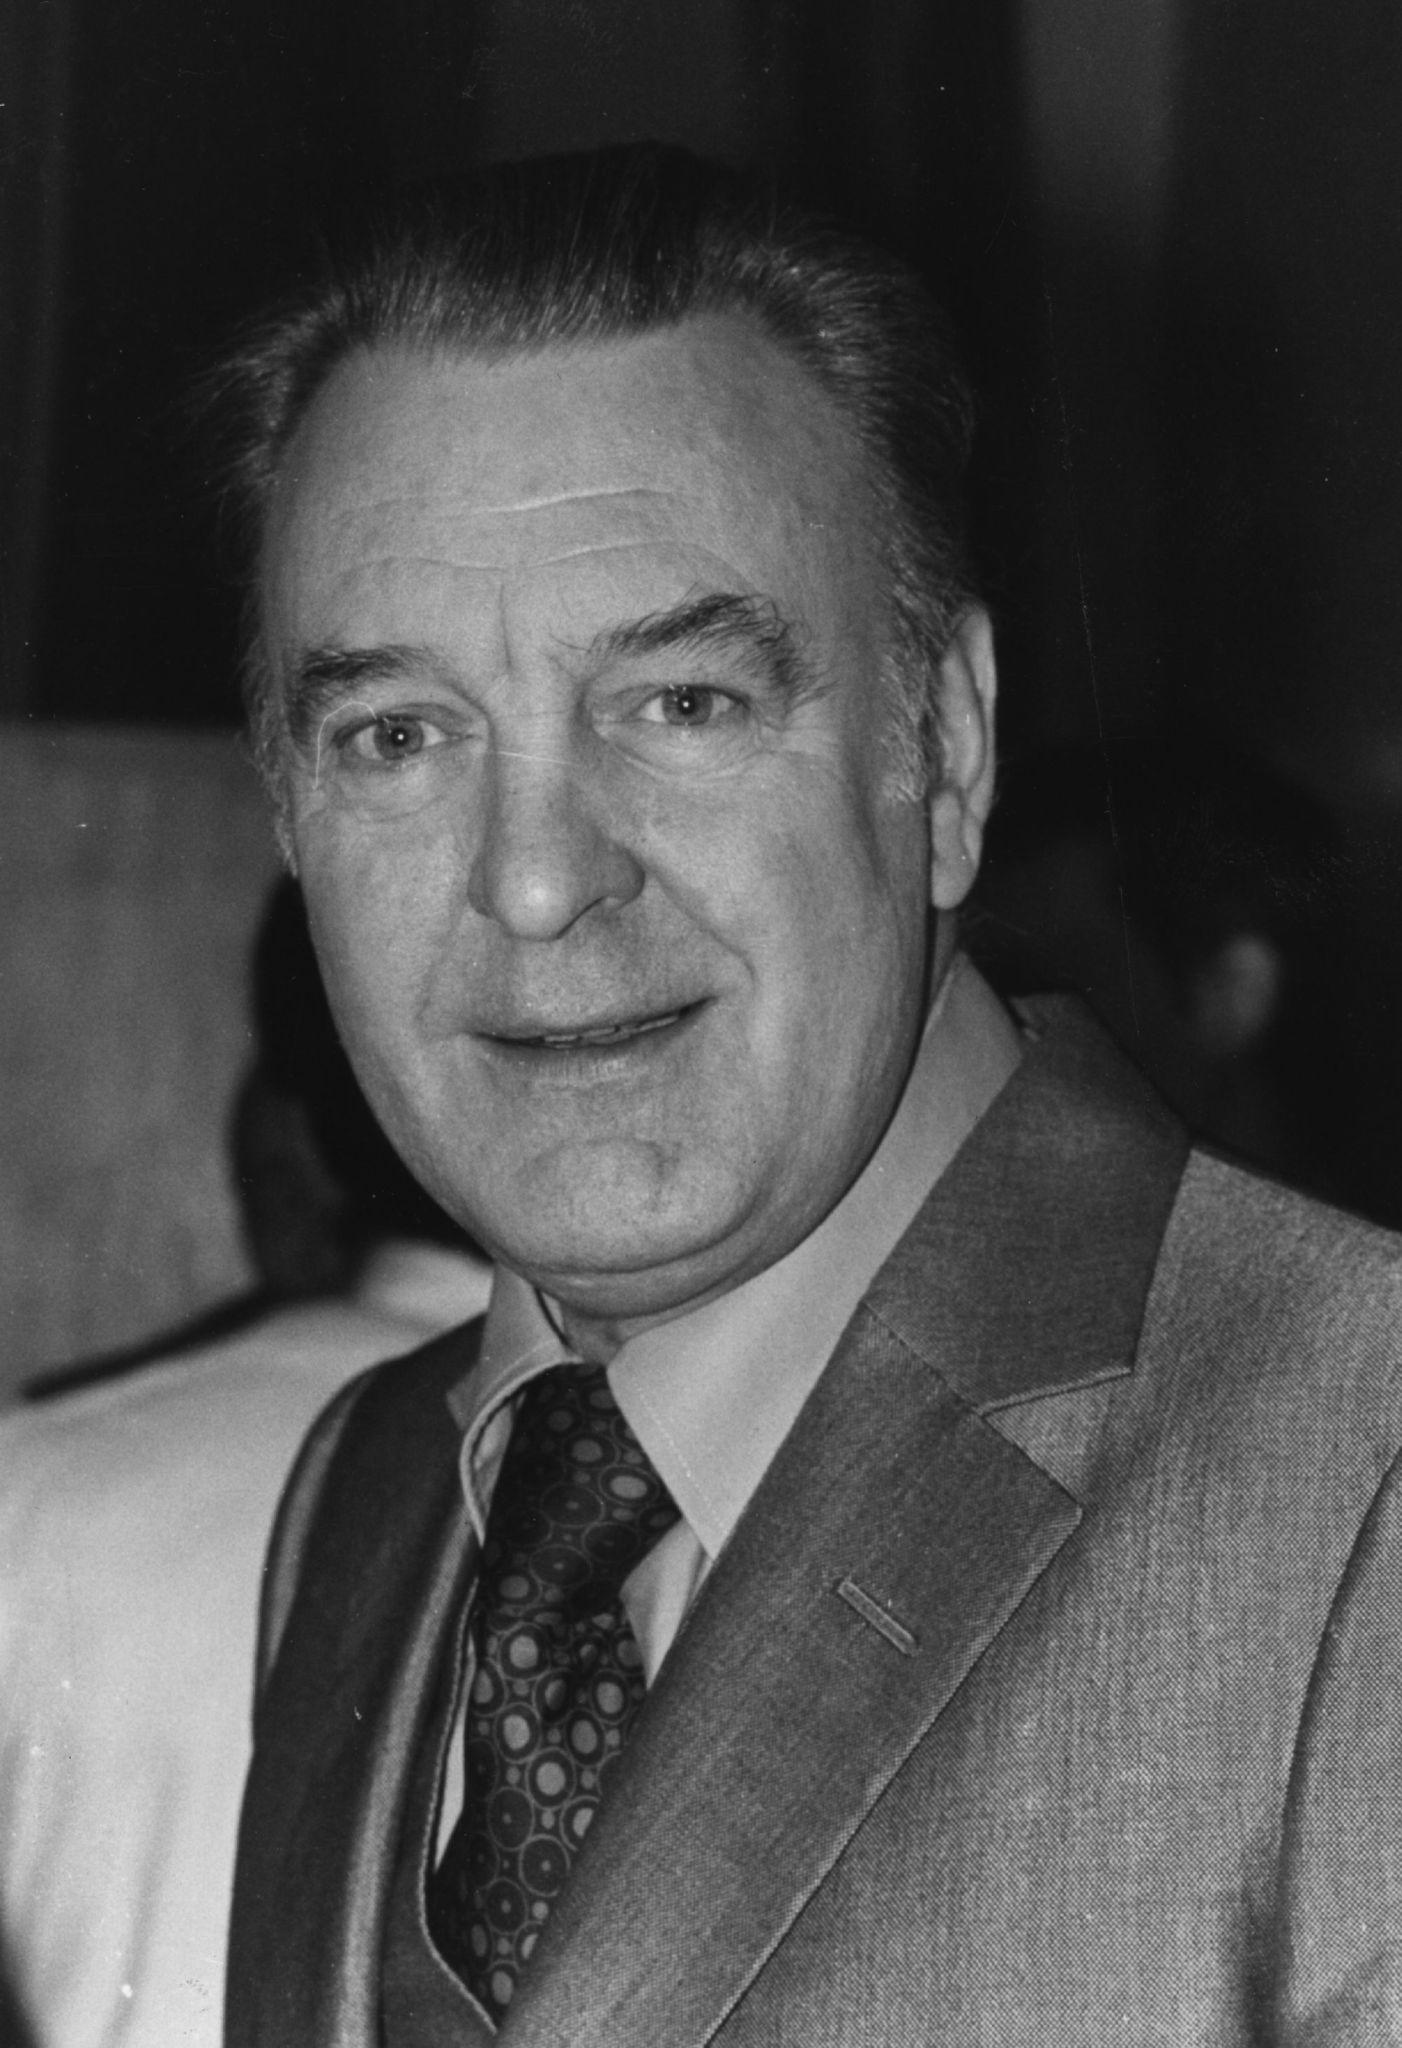 Donald Sinden (1923?014)